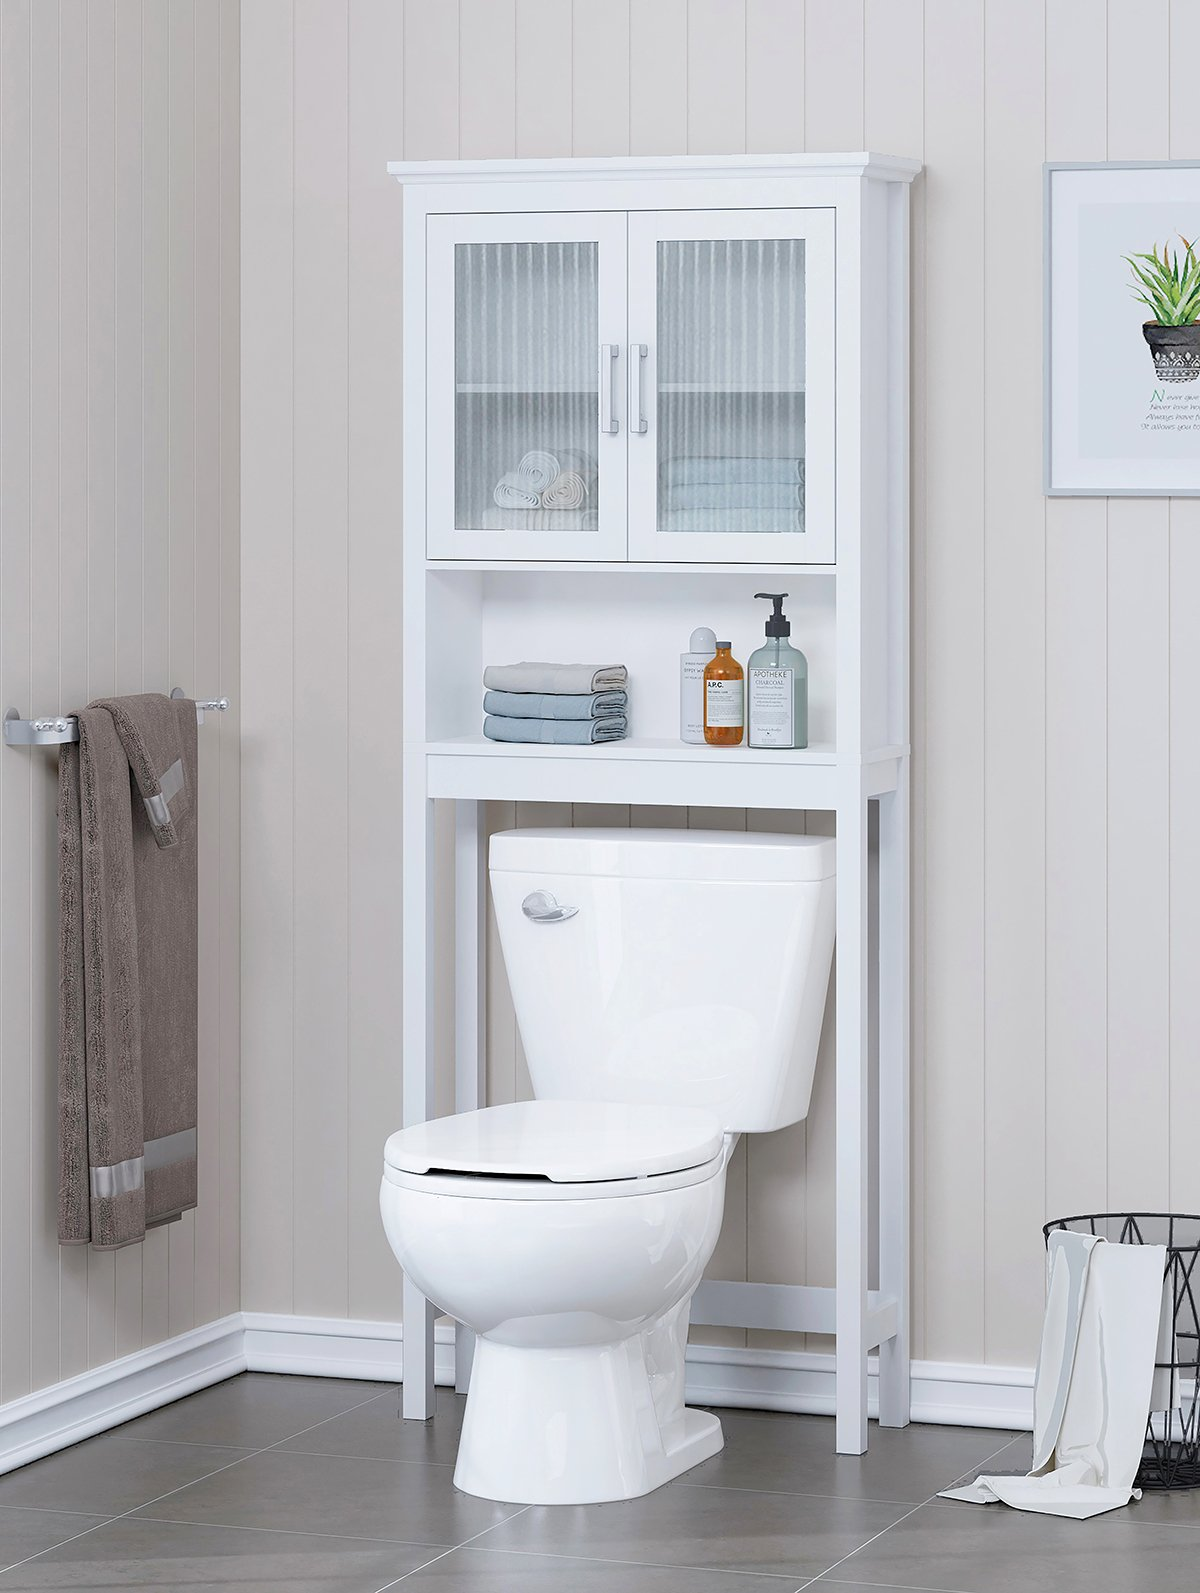 Spirich Home Bathroom Shelf Over The Toilet, Bathroom Cabinet Organizer with Moru Tempered Glass Door (White) by Spirich